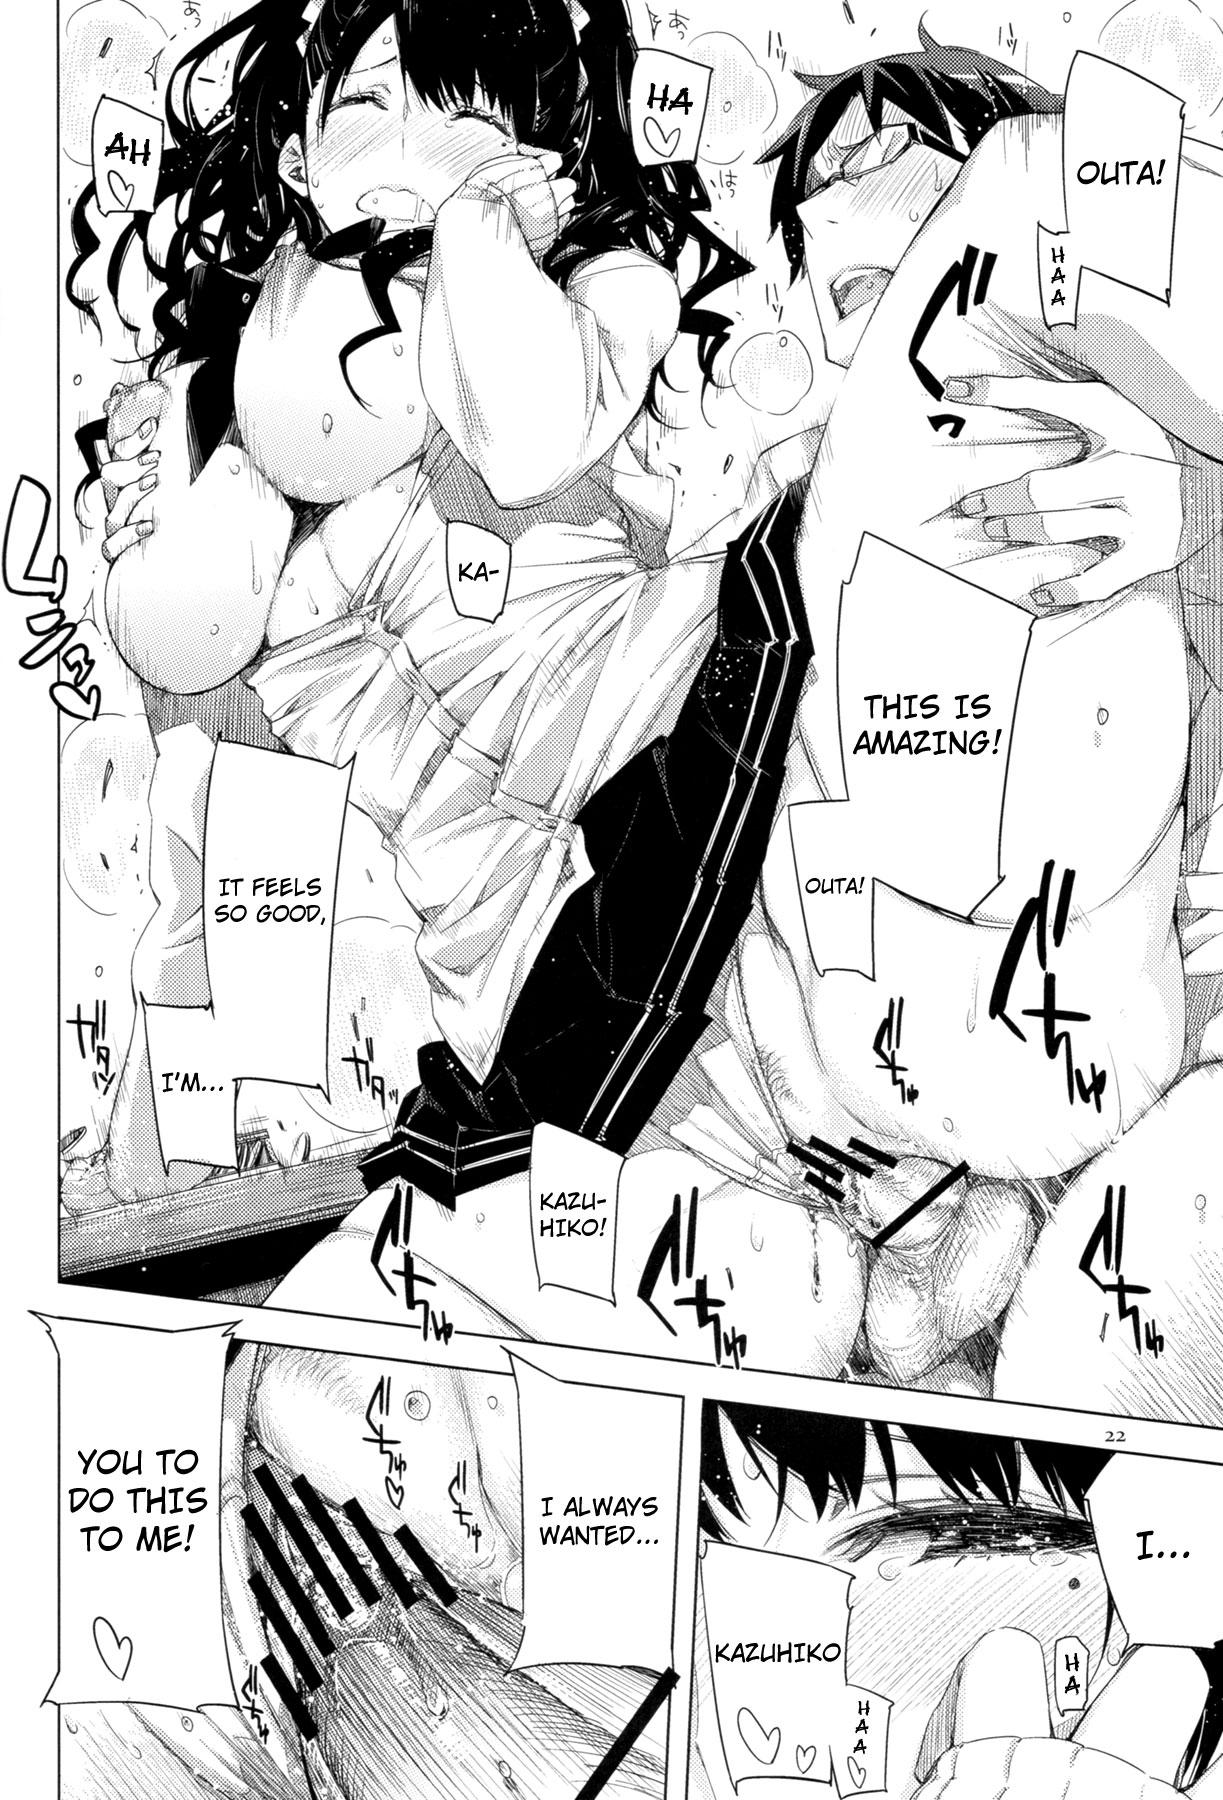 ED no Eroi Hon desu. | This is ED's Erotic Book 21